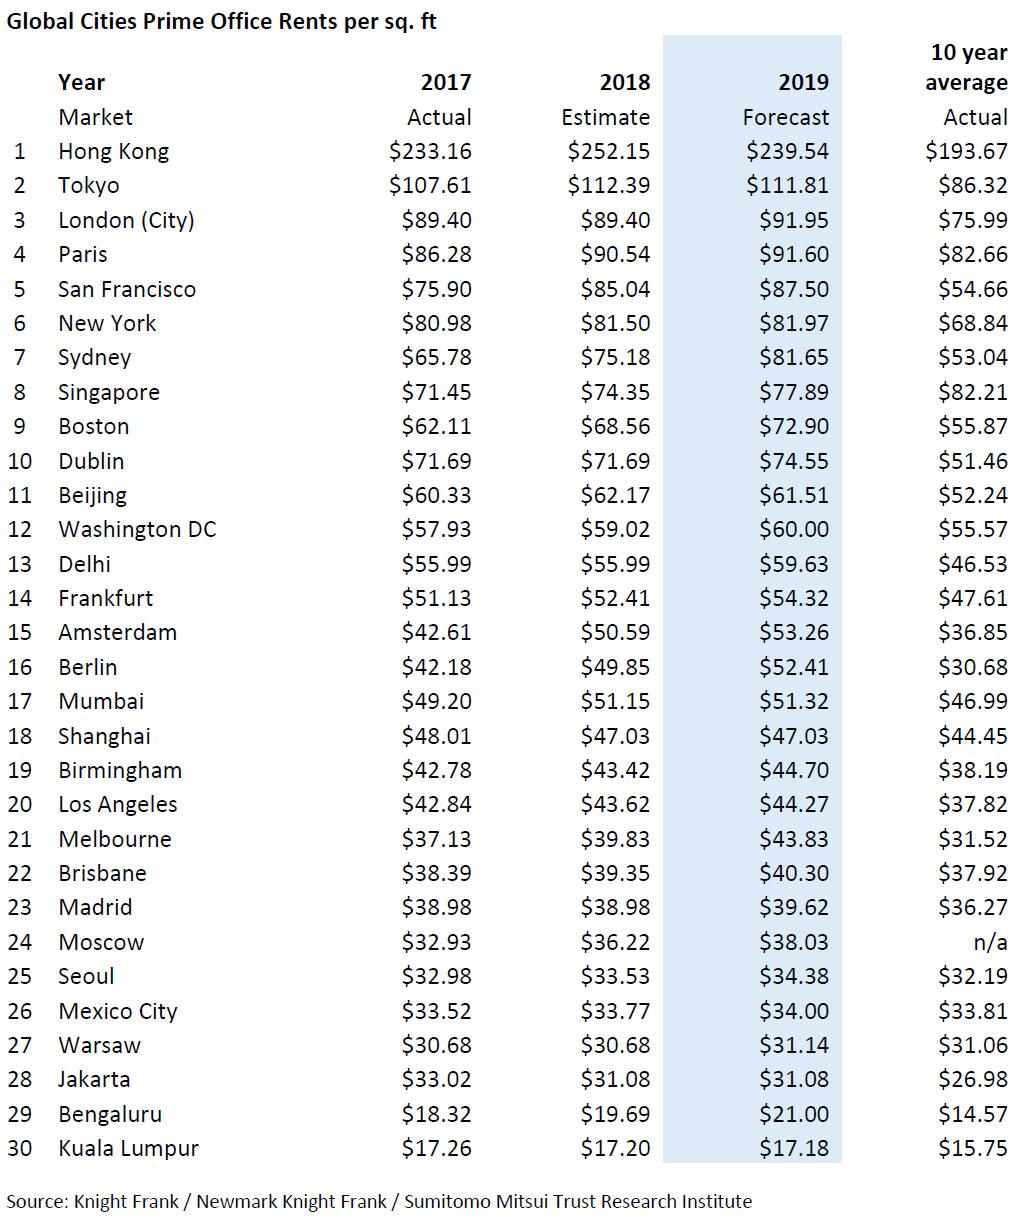 WPJ News | Global Cities Prime Office Rents per SQFT